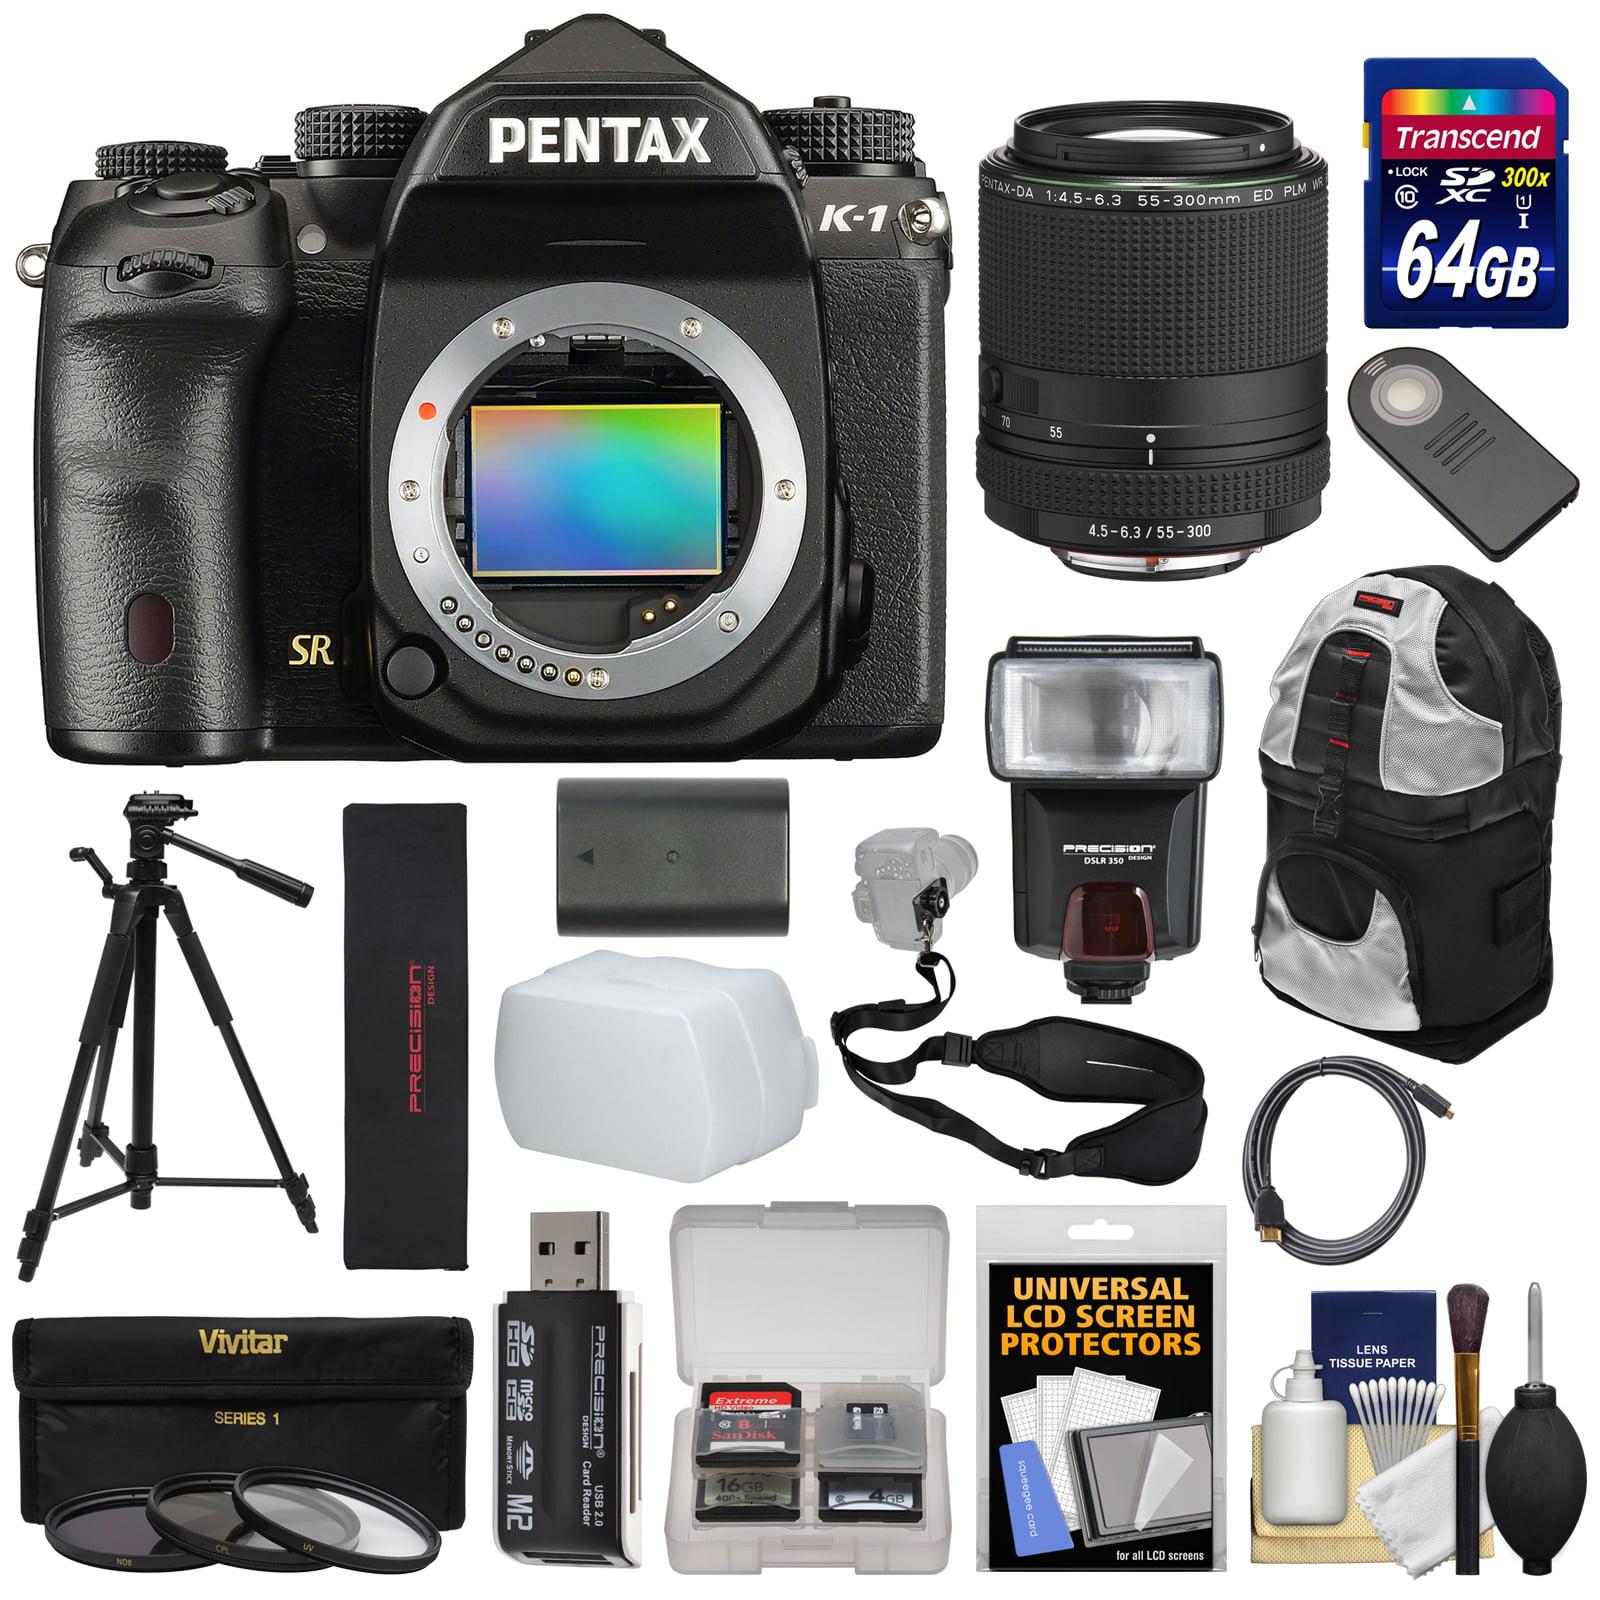 Pentax K-1 Mark II Full Frame Wi-Fi Digital SLR Camera Body & 55-300mm WR Lens with 64GB Card + Battery +... by Pentax